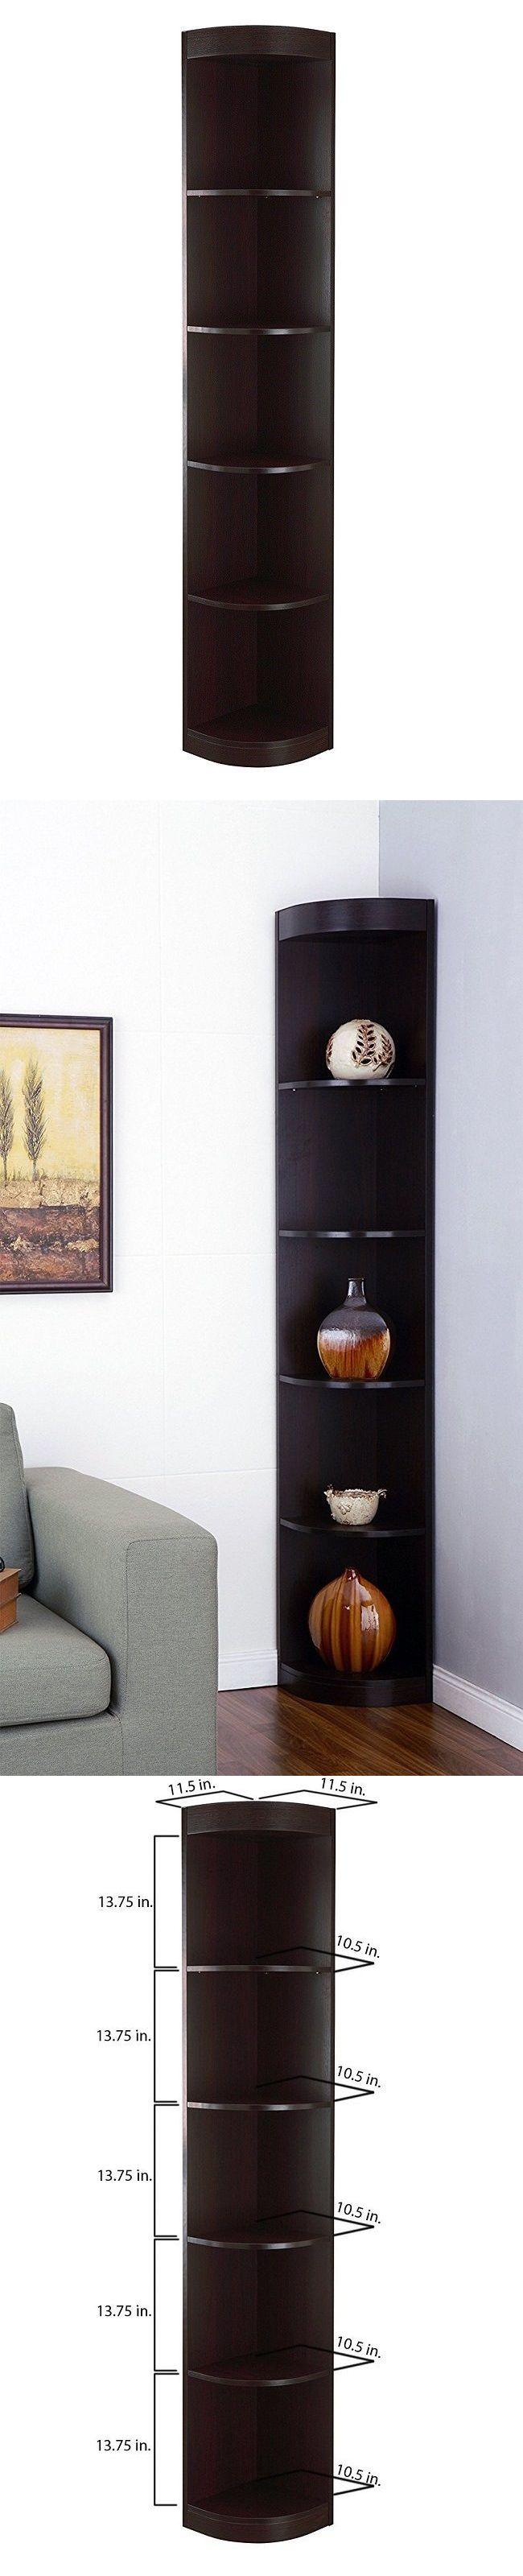 Buy 5 shelf solid teak corner shelf unit from bed bath amp beyond - Bookcases 3199 Corner Shelf Wall Unit Wood Bookcase Storage Decor Tall Inside 5 Tier Standing